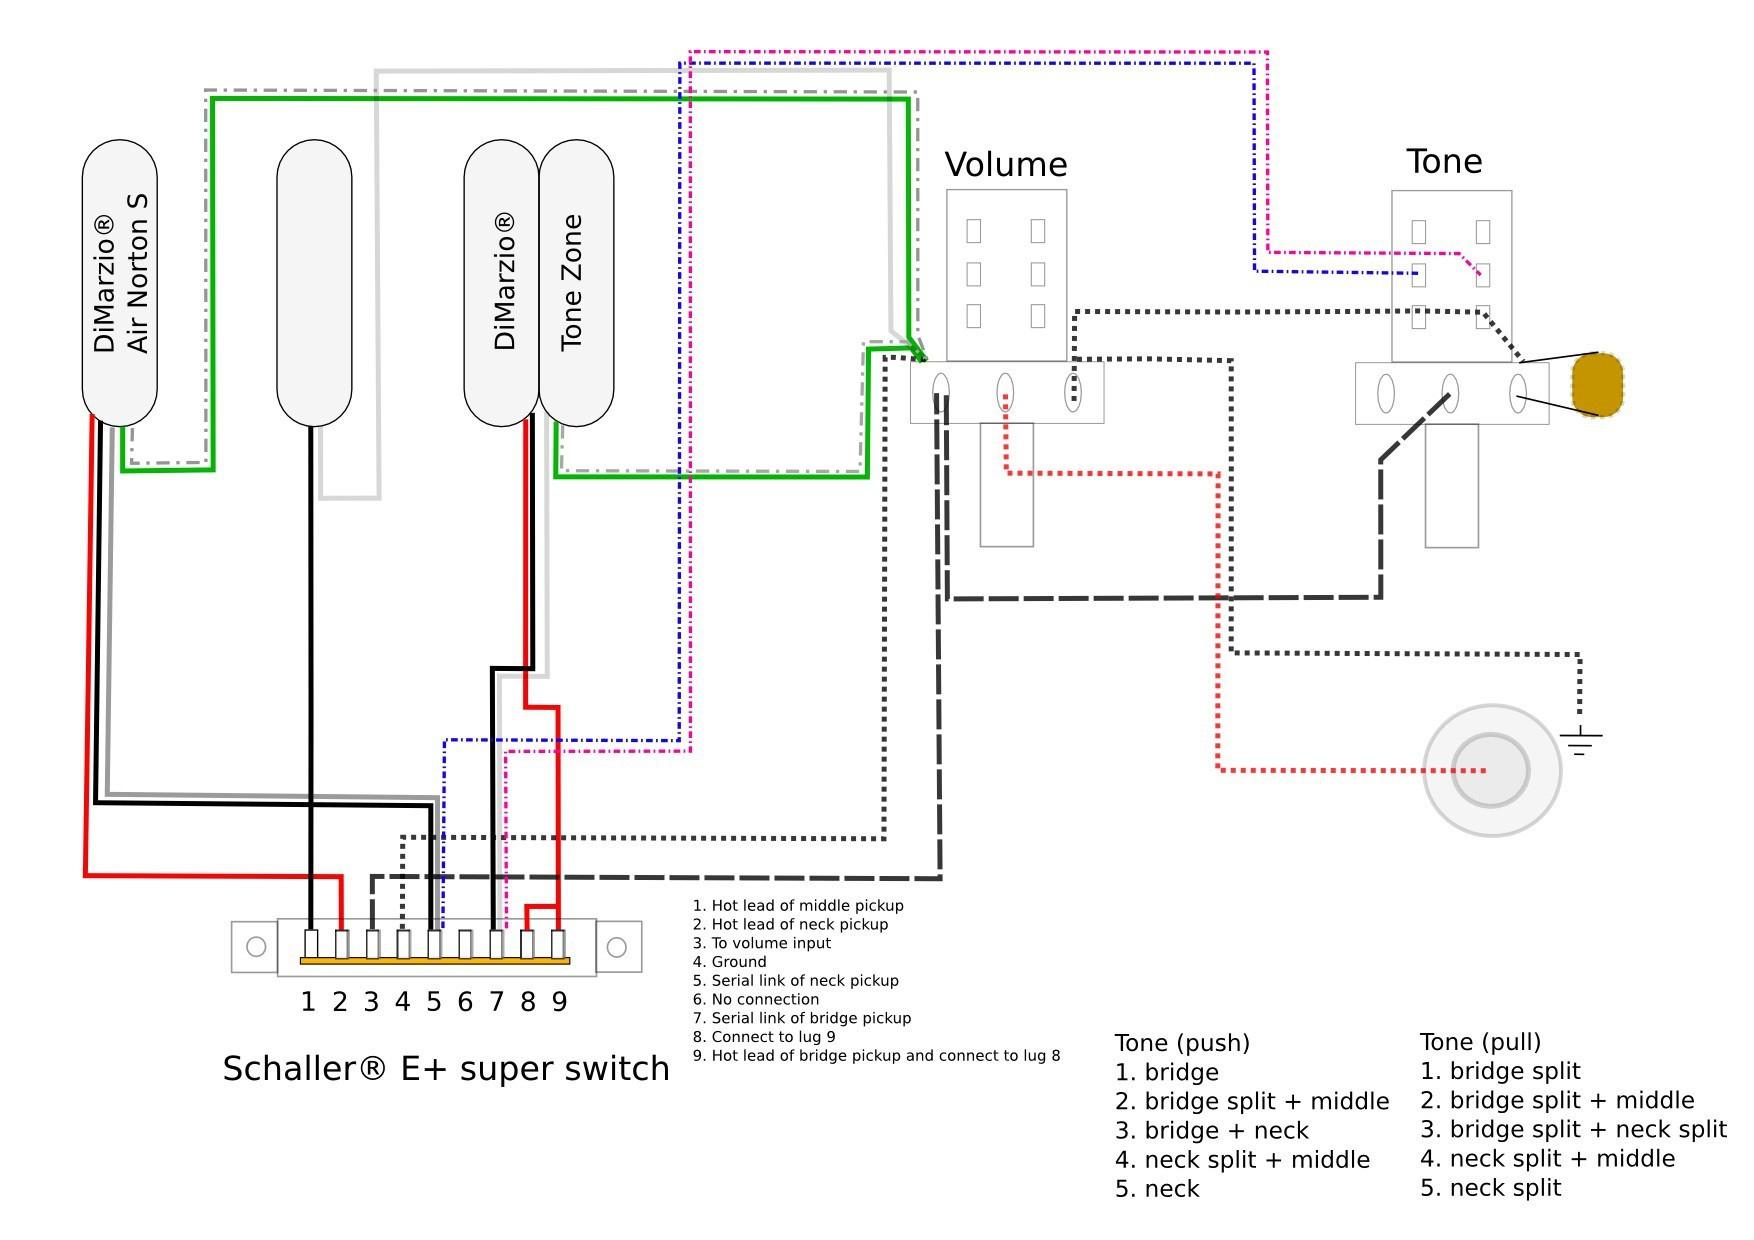 Wiring Diagram Prime Hsh 5 Way Switch Inspirations Guitar Diagrams 2 - Dimarzio Wiring Diagram